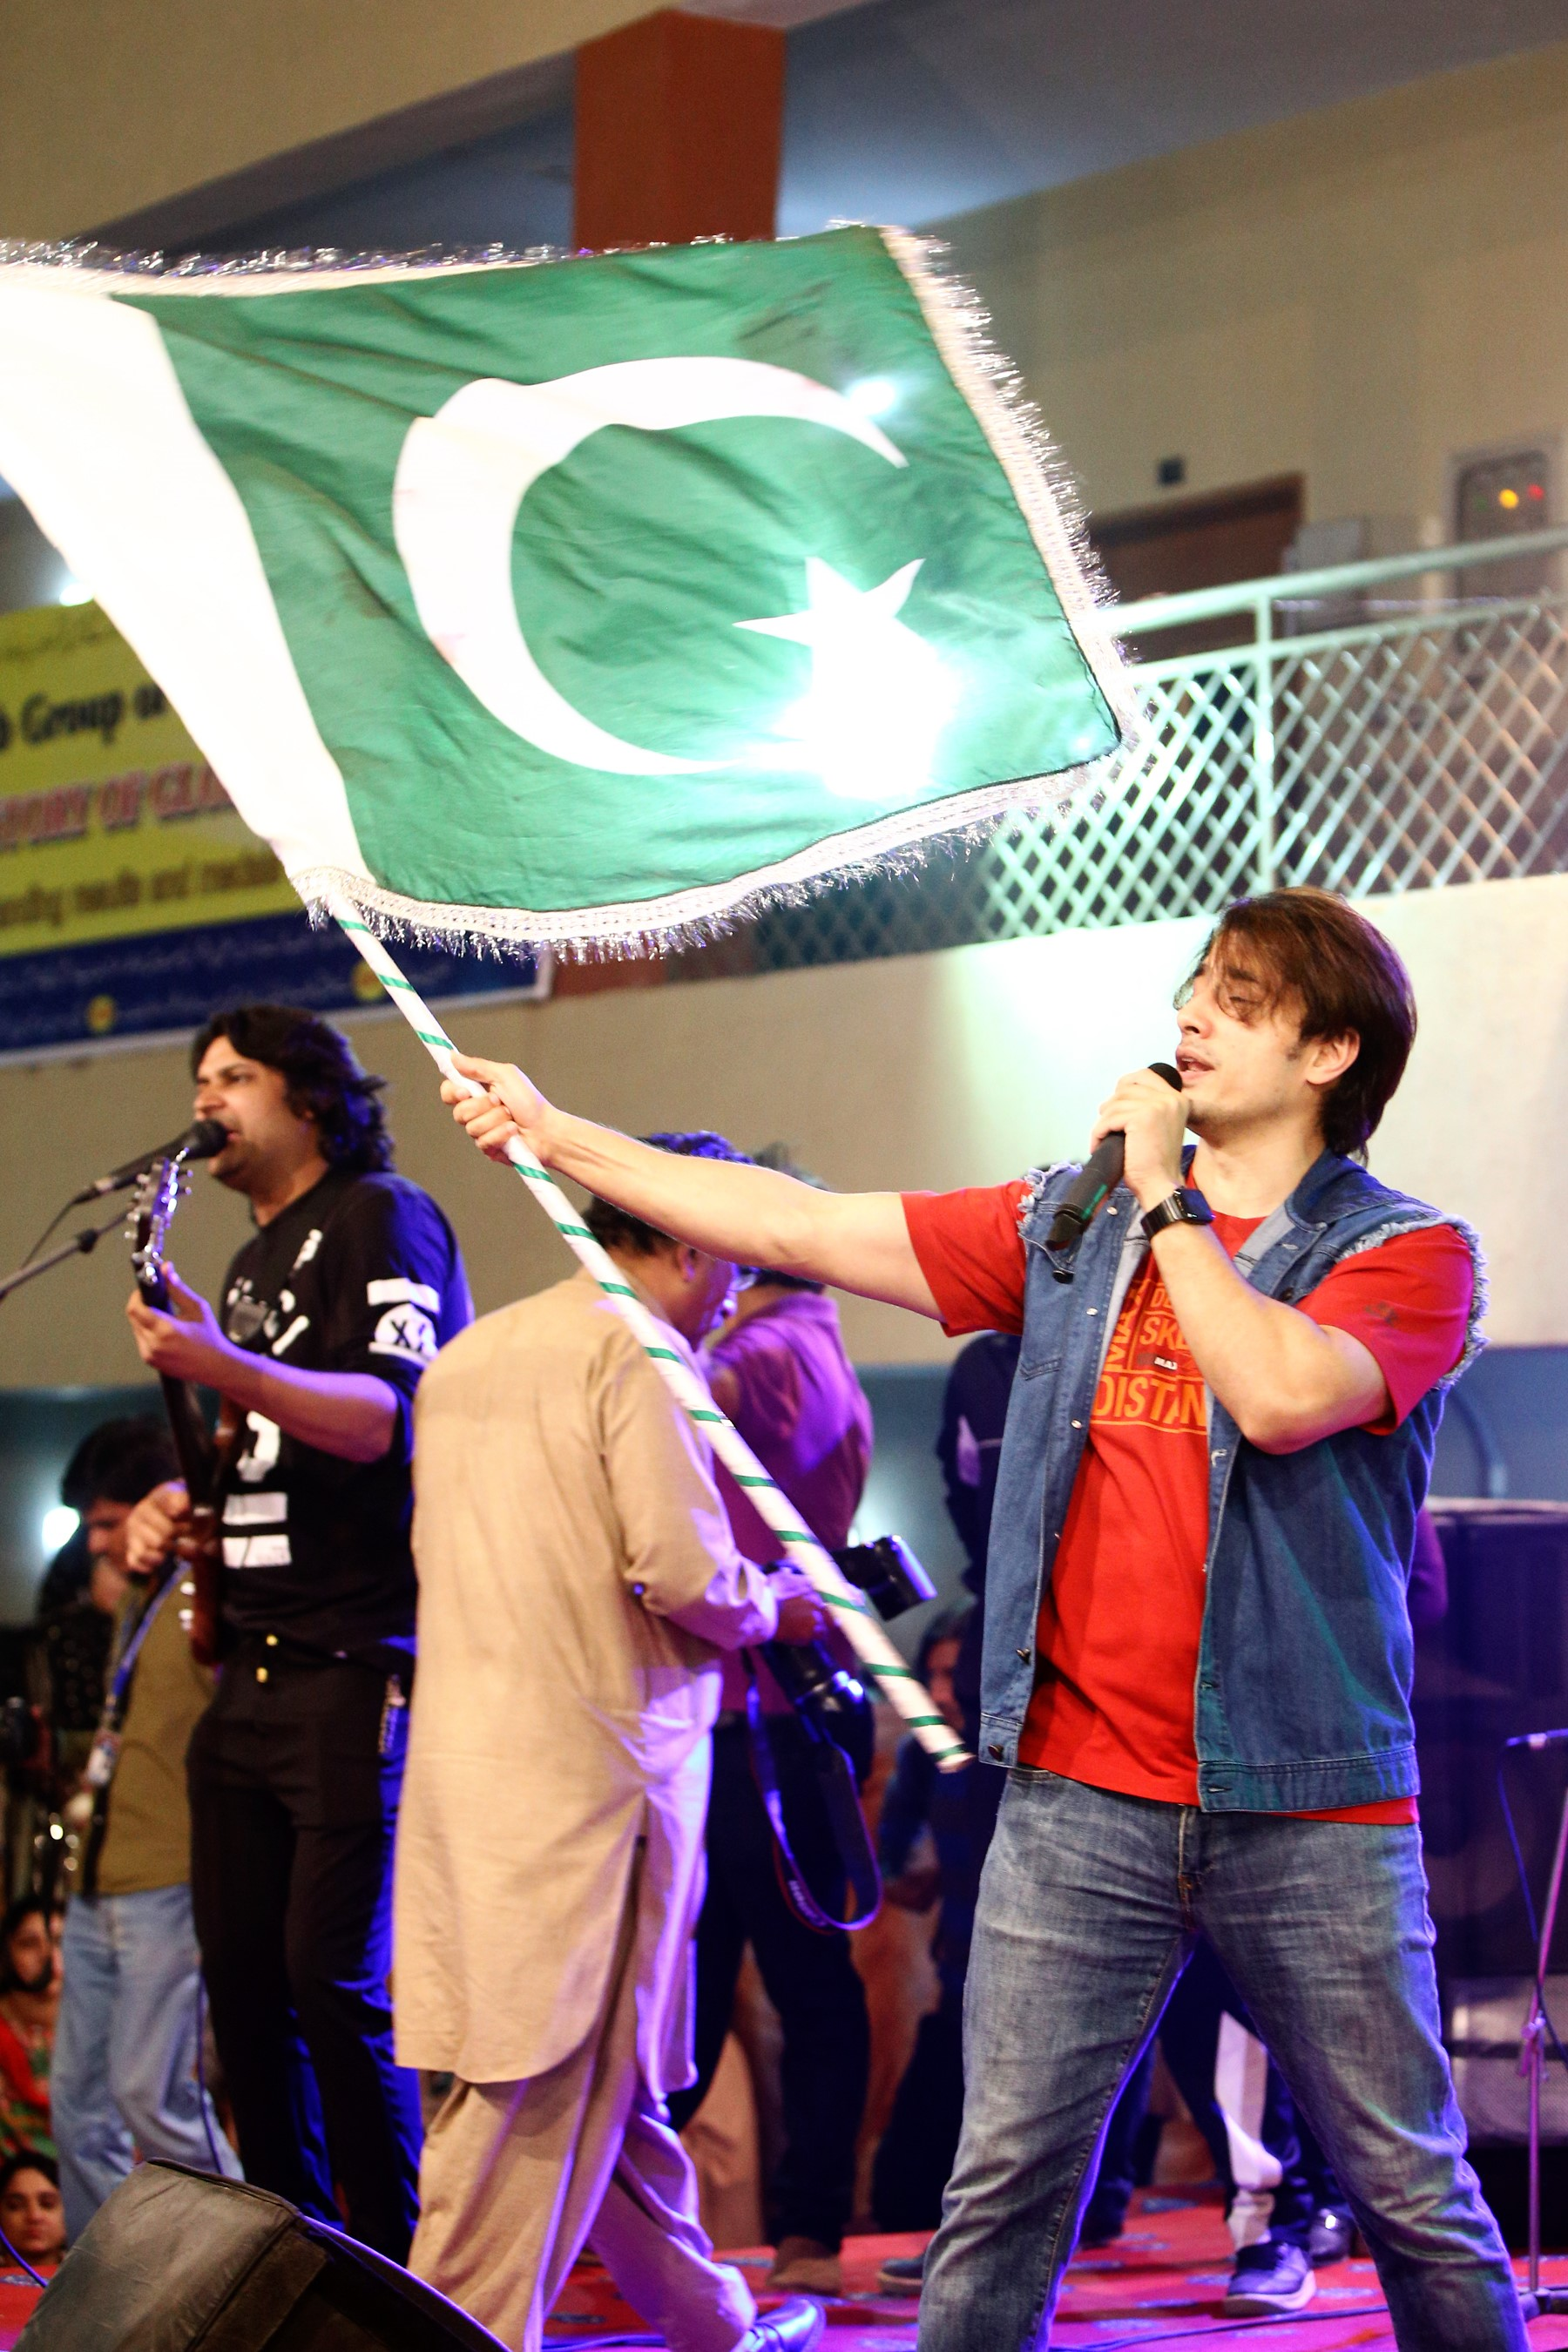 Ali zafar concert punjab